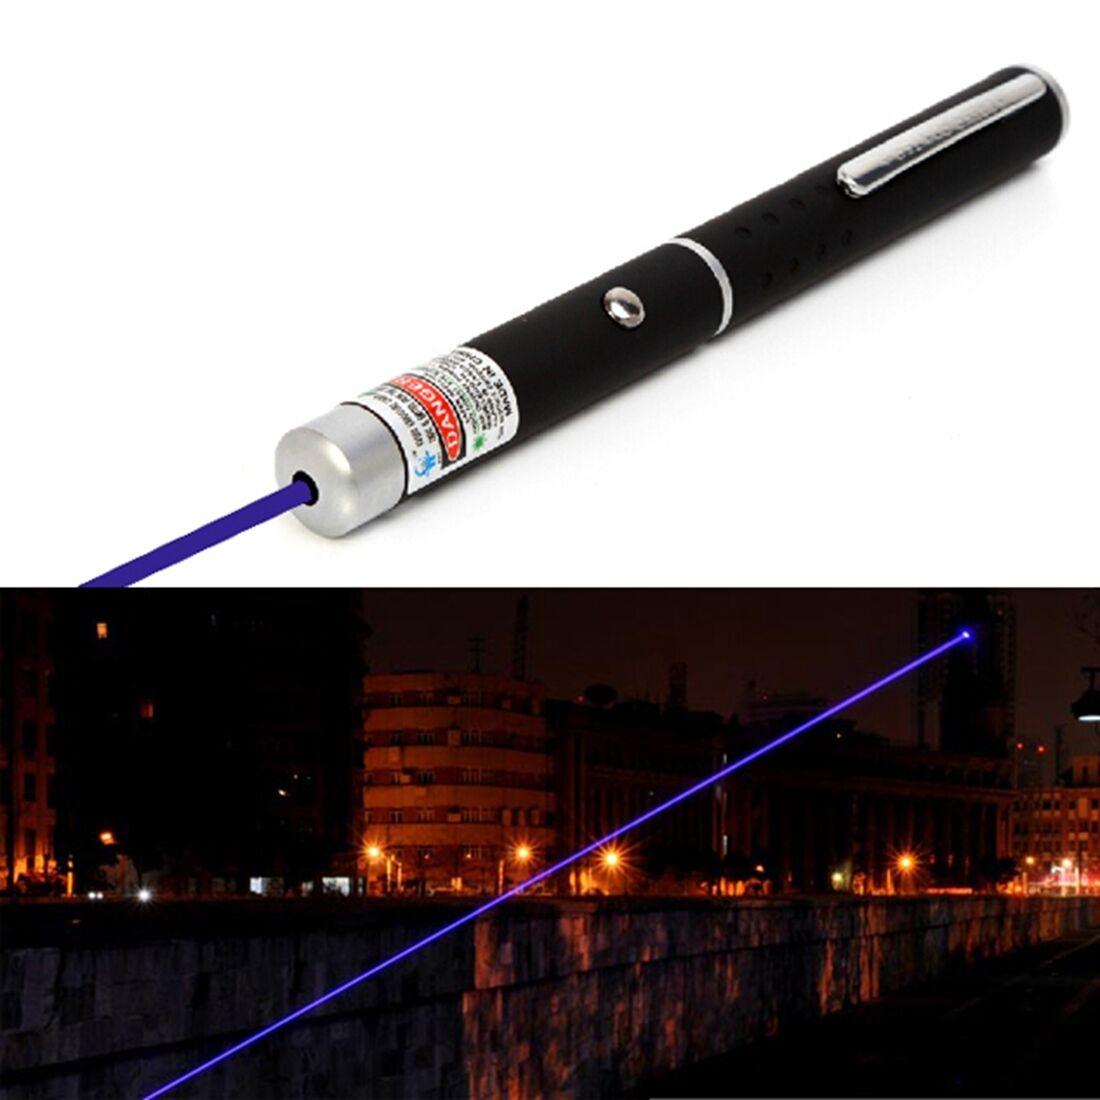 1mW 532nm Powerful Laser Pointer Pen Visible Beam Light Lazer Pen Toy Kids Gift 3